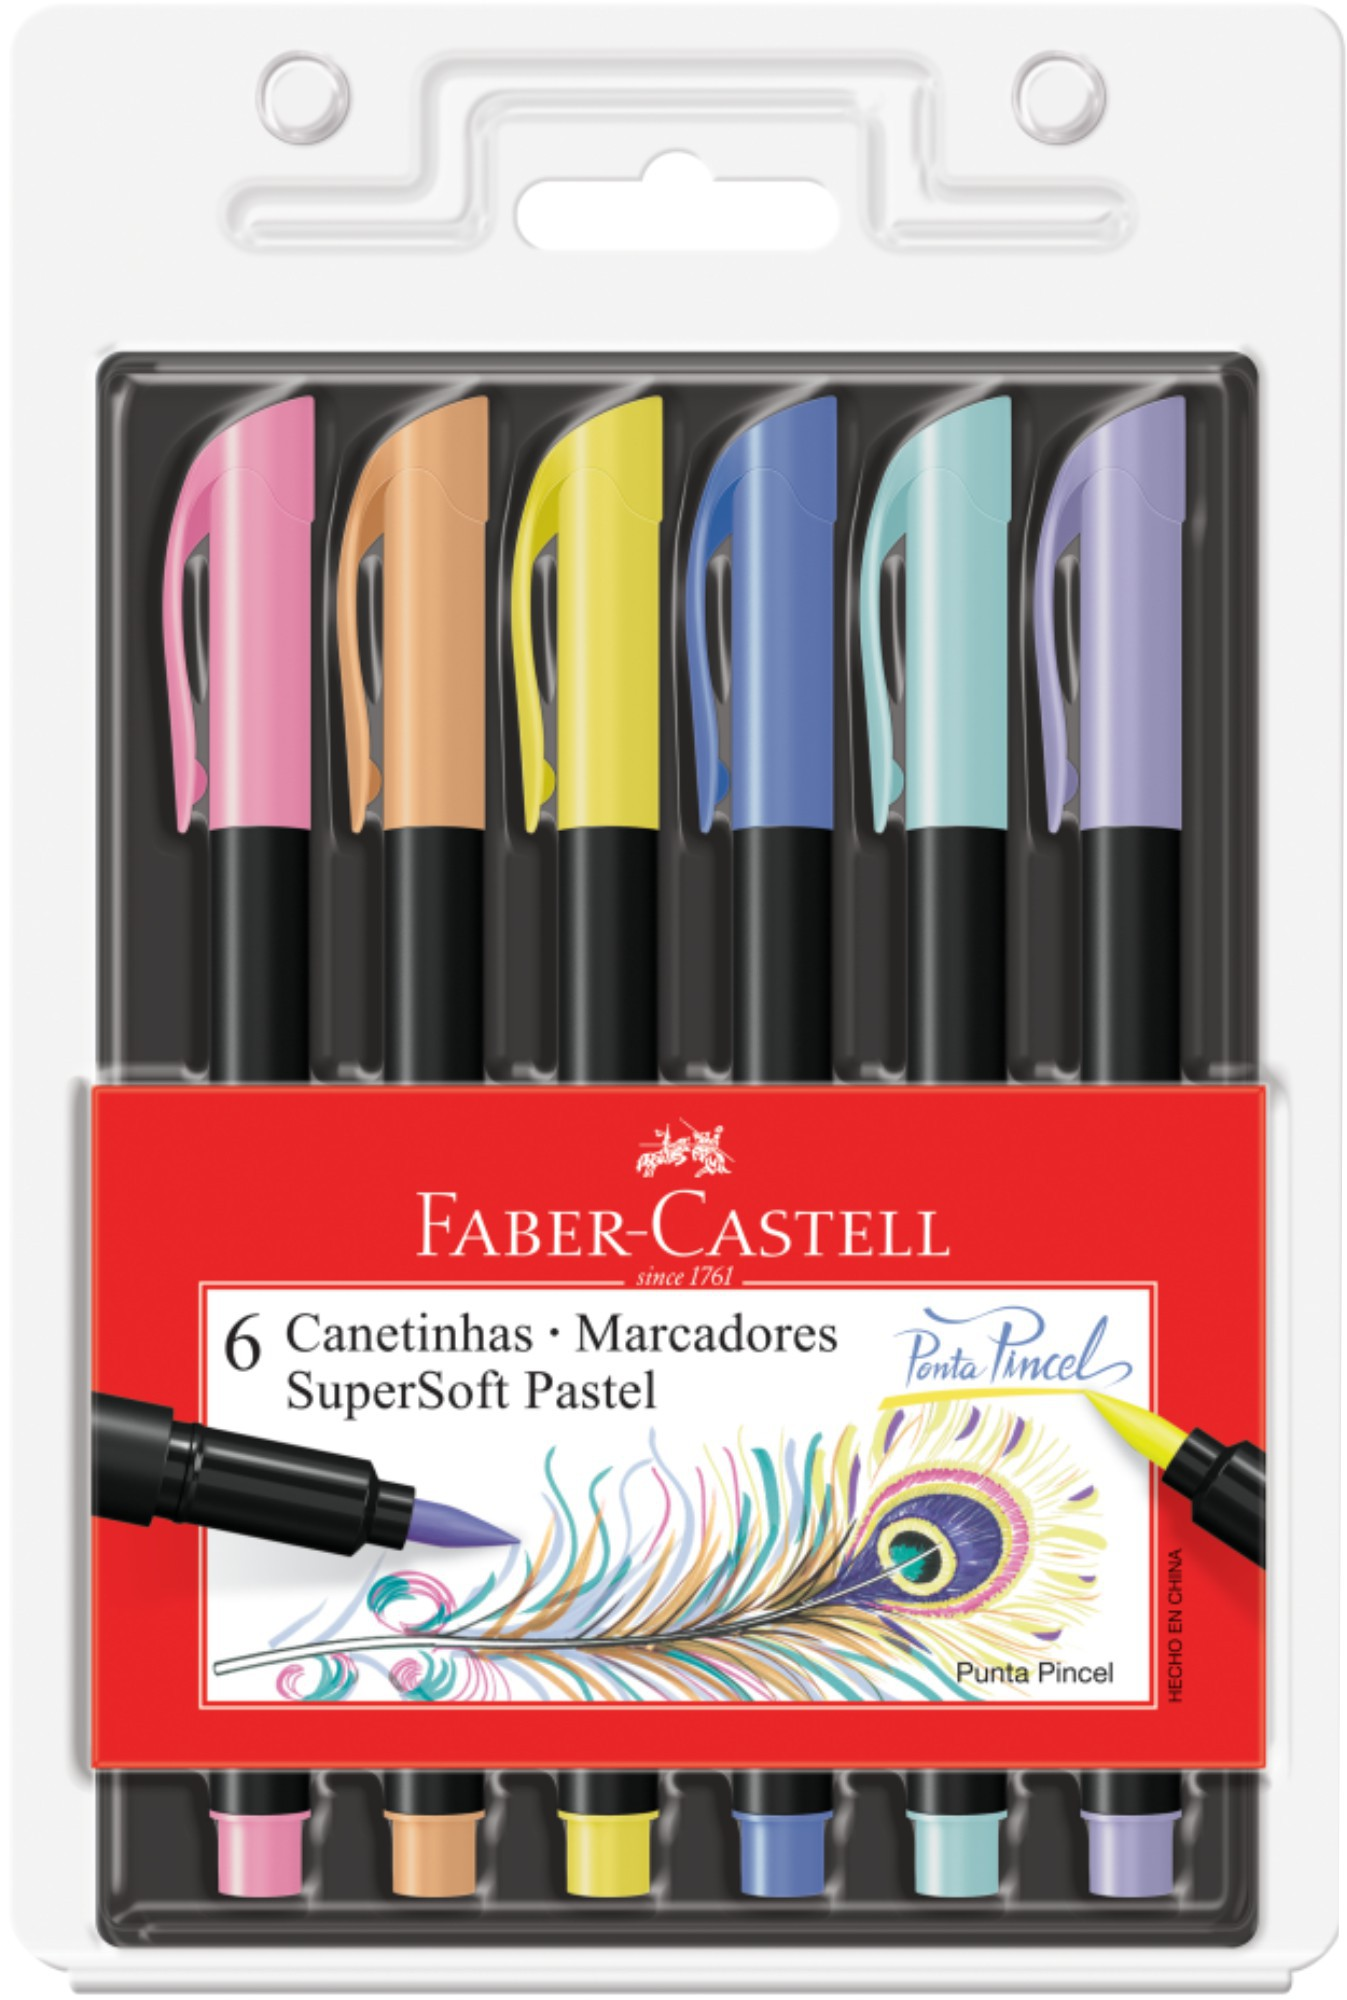 Caneta Brush Pen Super Soft Pastel Faber Castell 6 Cores